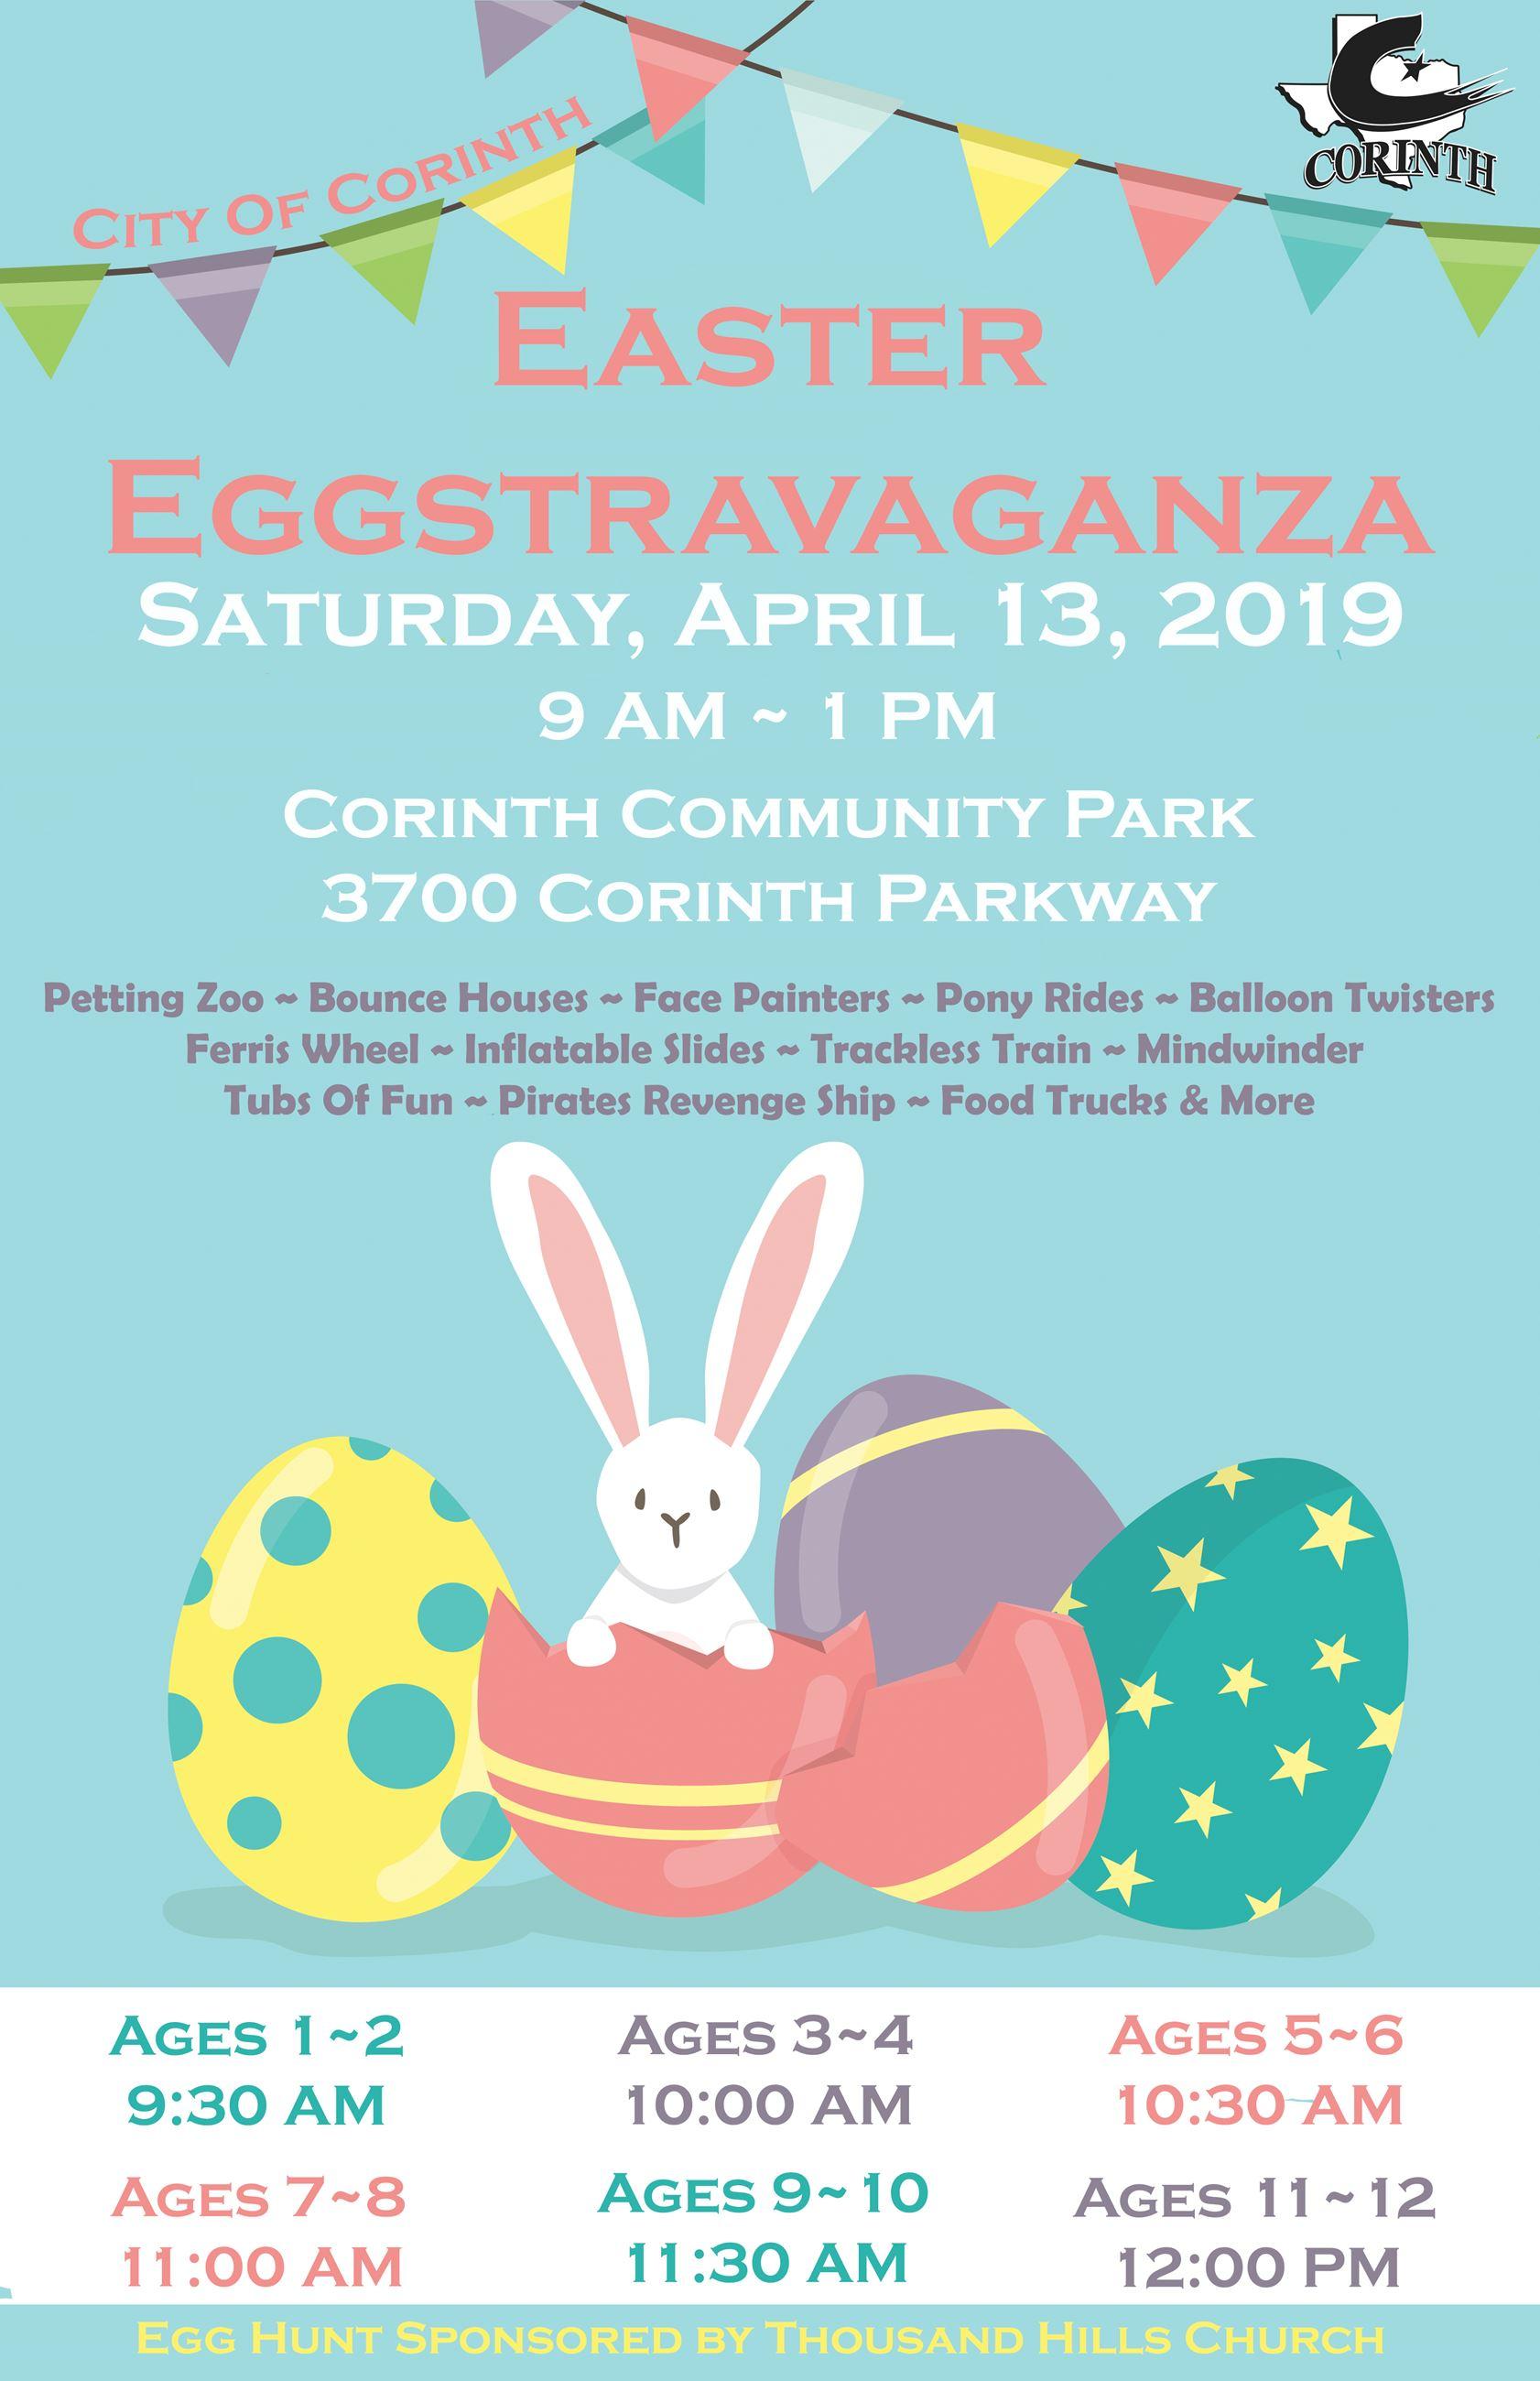 Corinth Easter Egg-Stravaganza